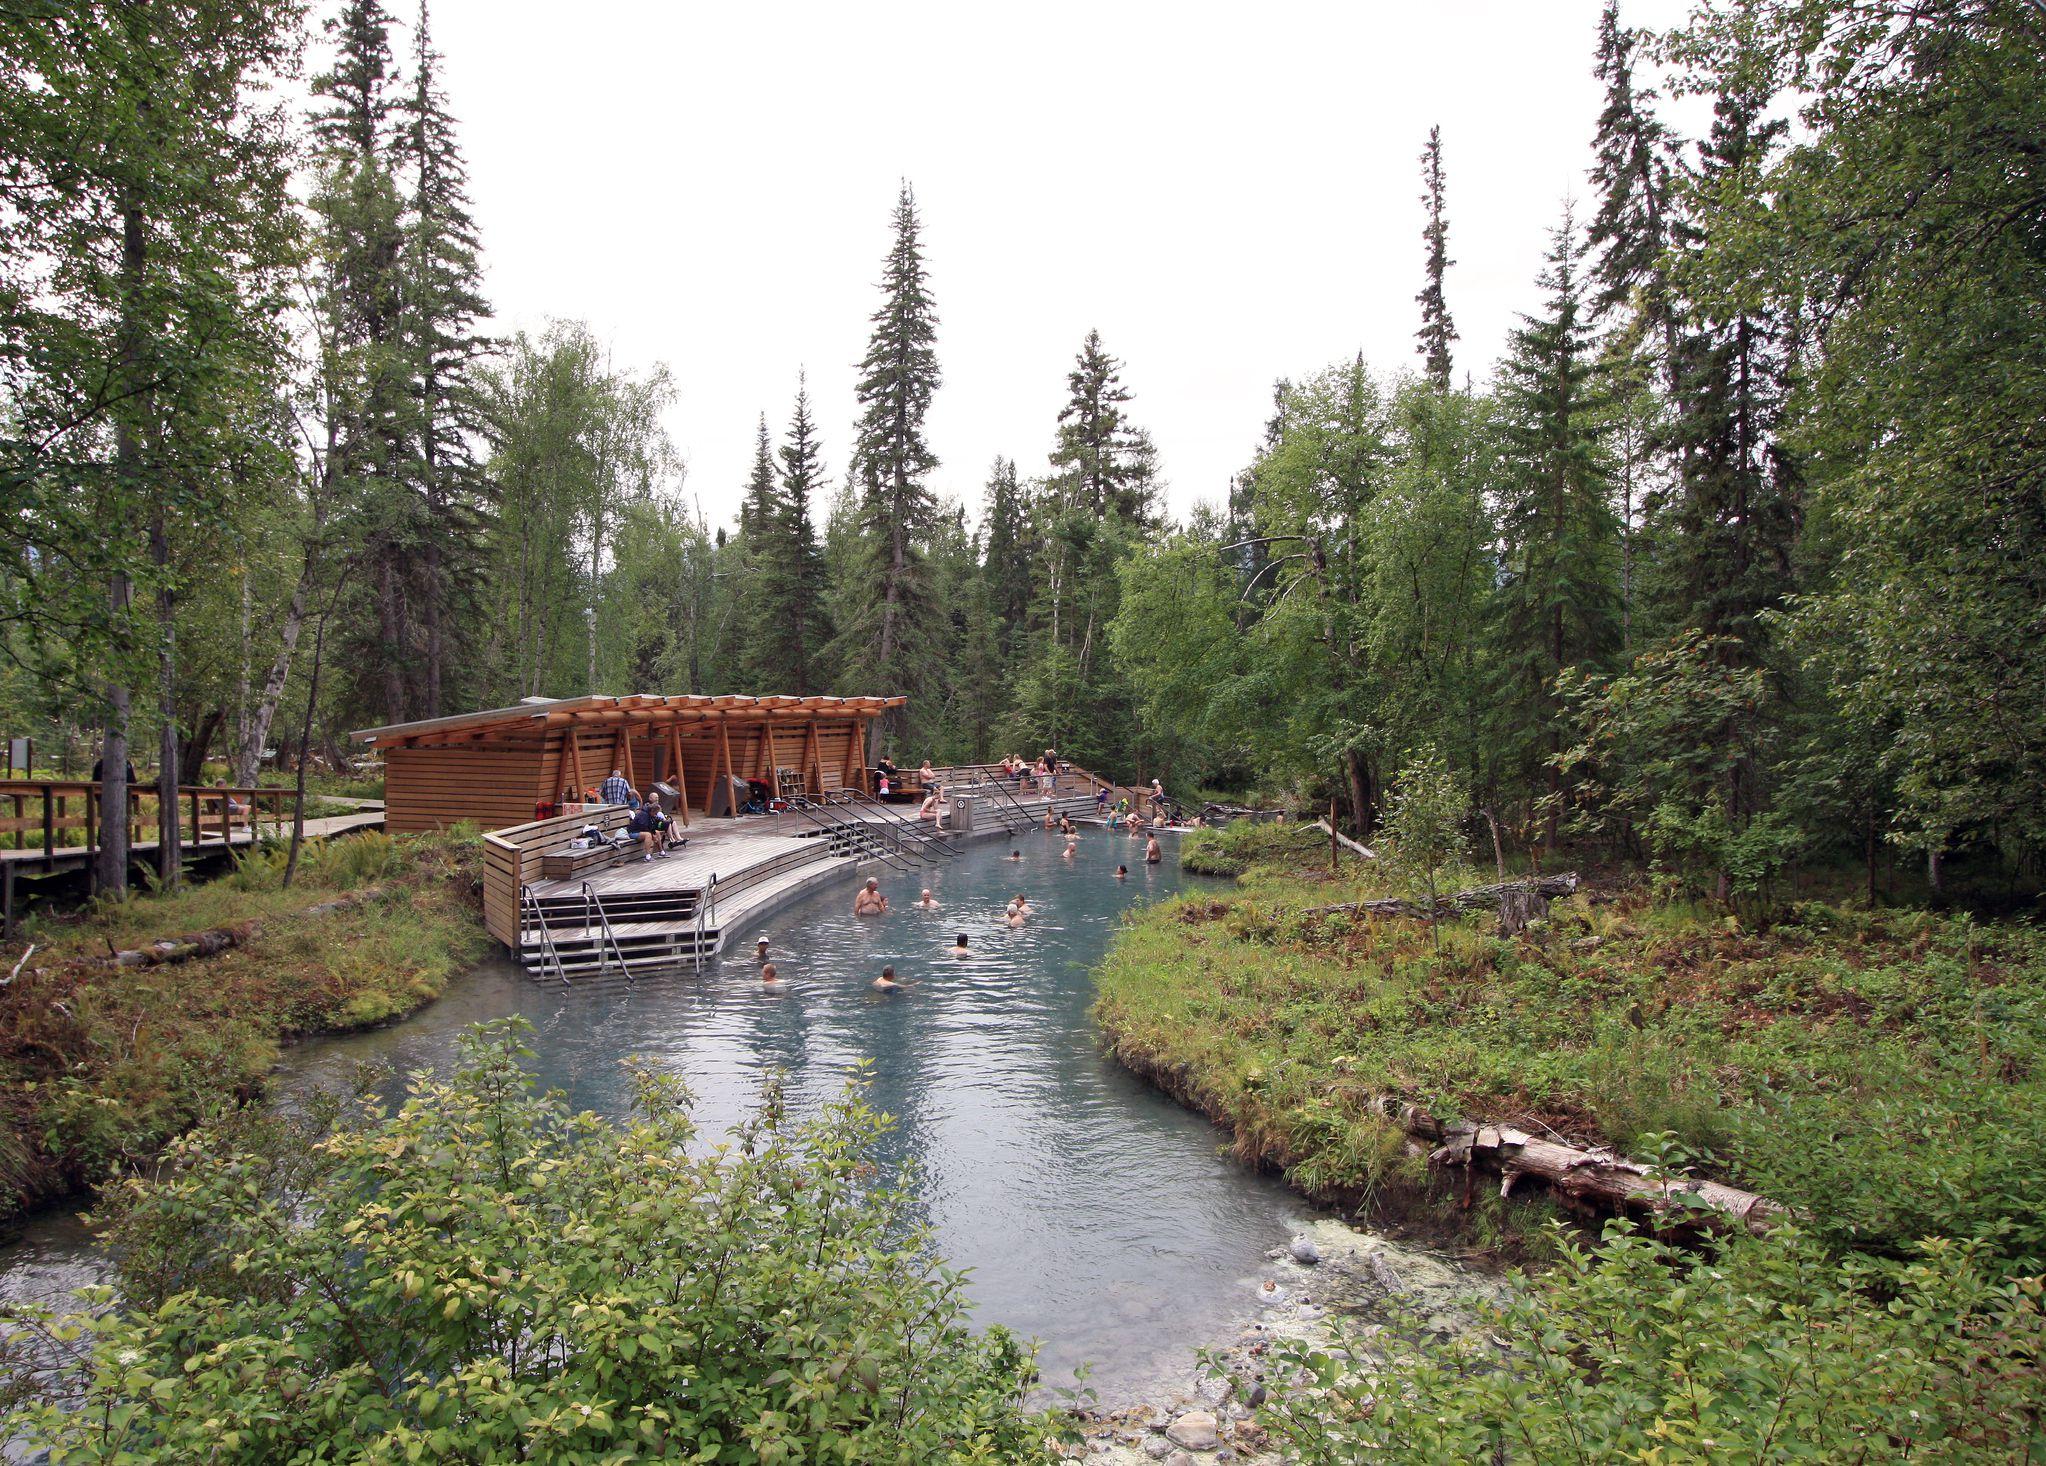 Liard River Hot Springs in British Columbia, Canada.